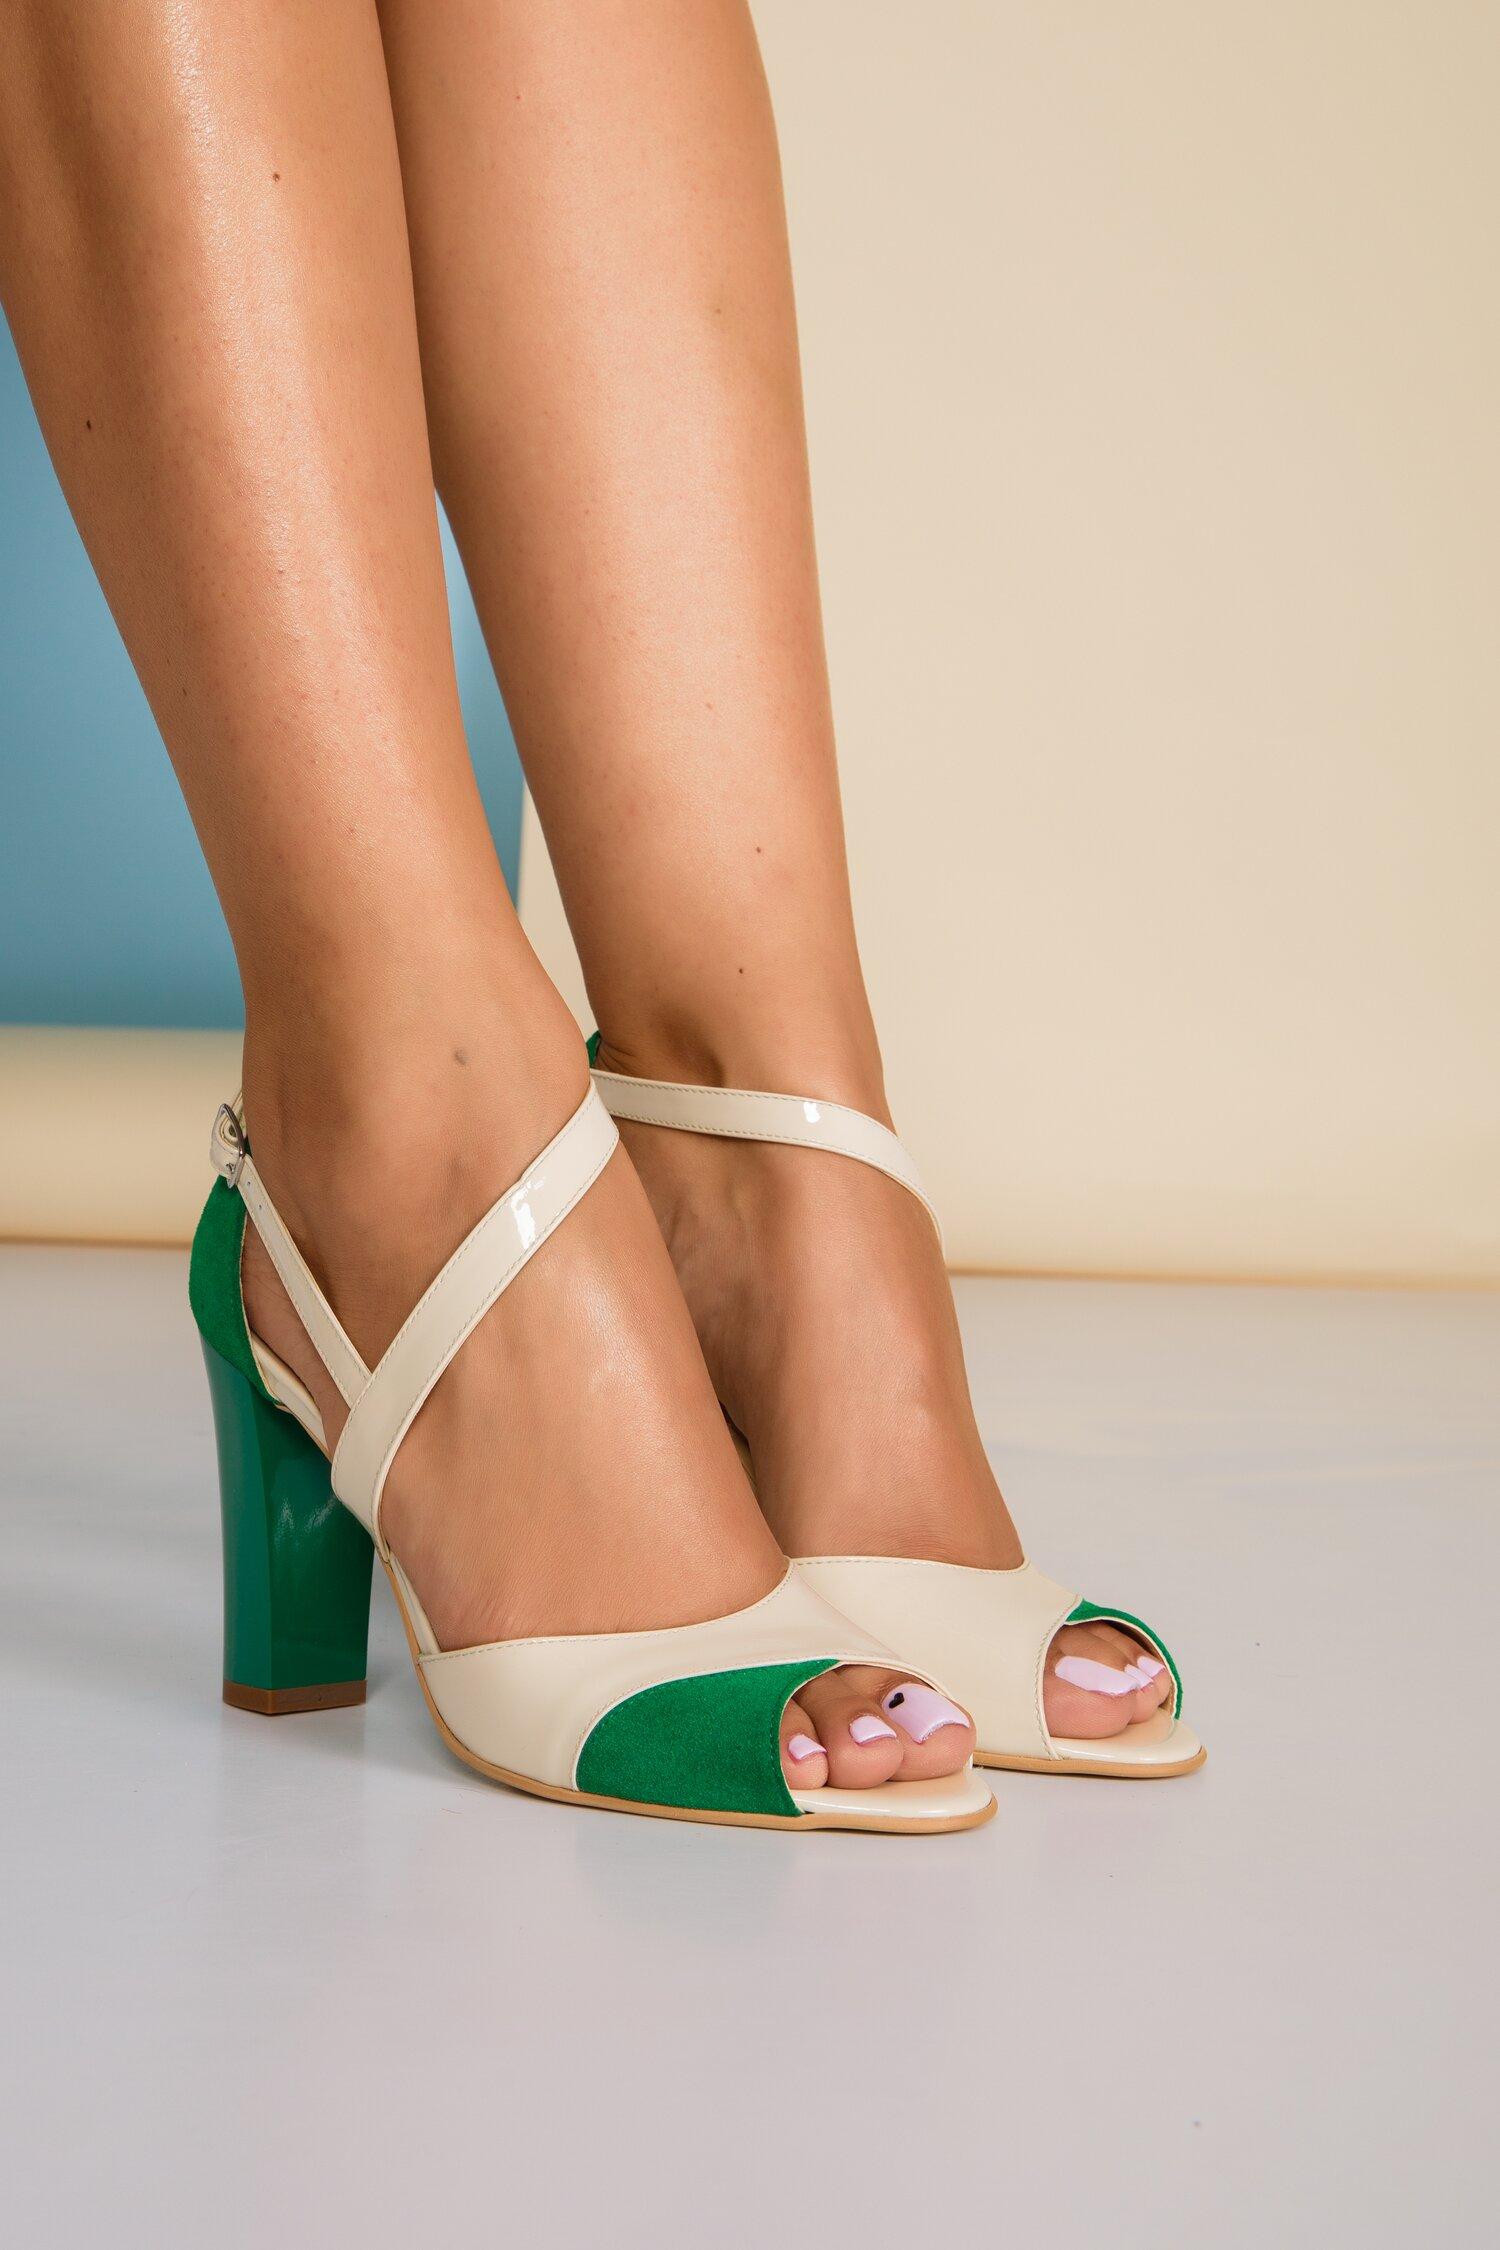 Sandale bej cu detalii verzi imagine